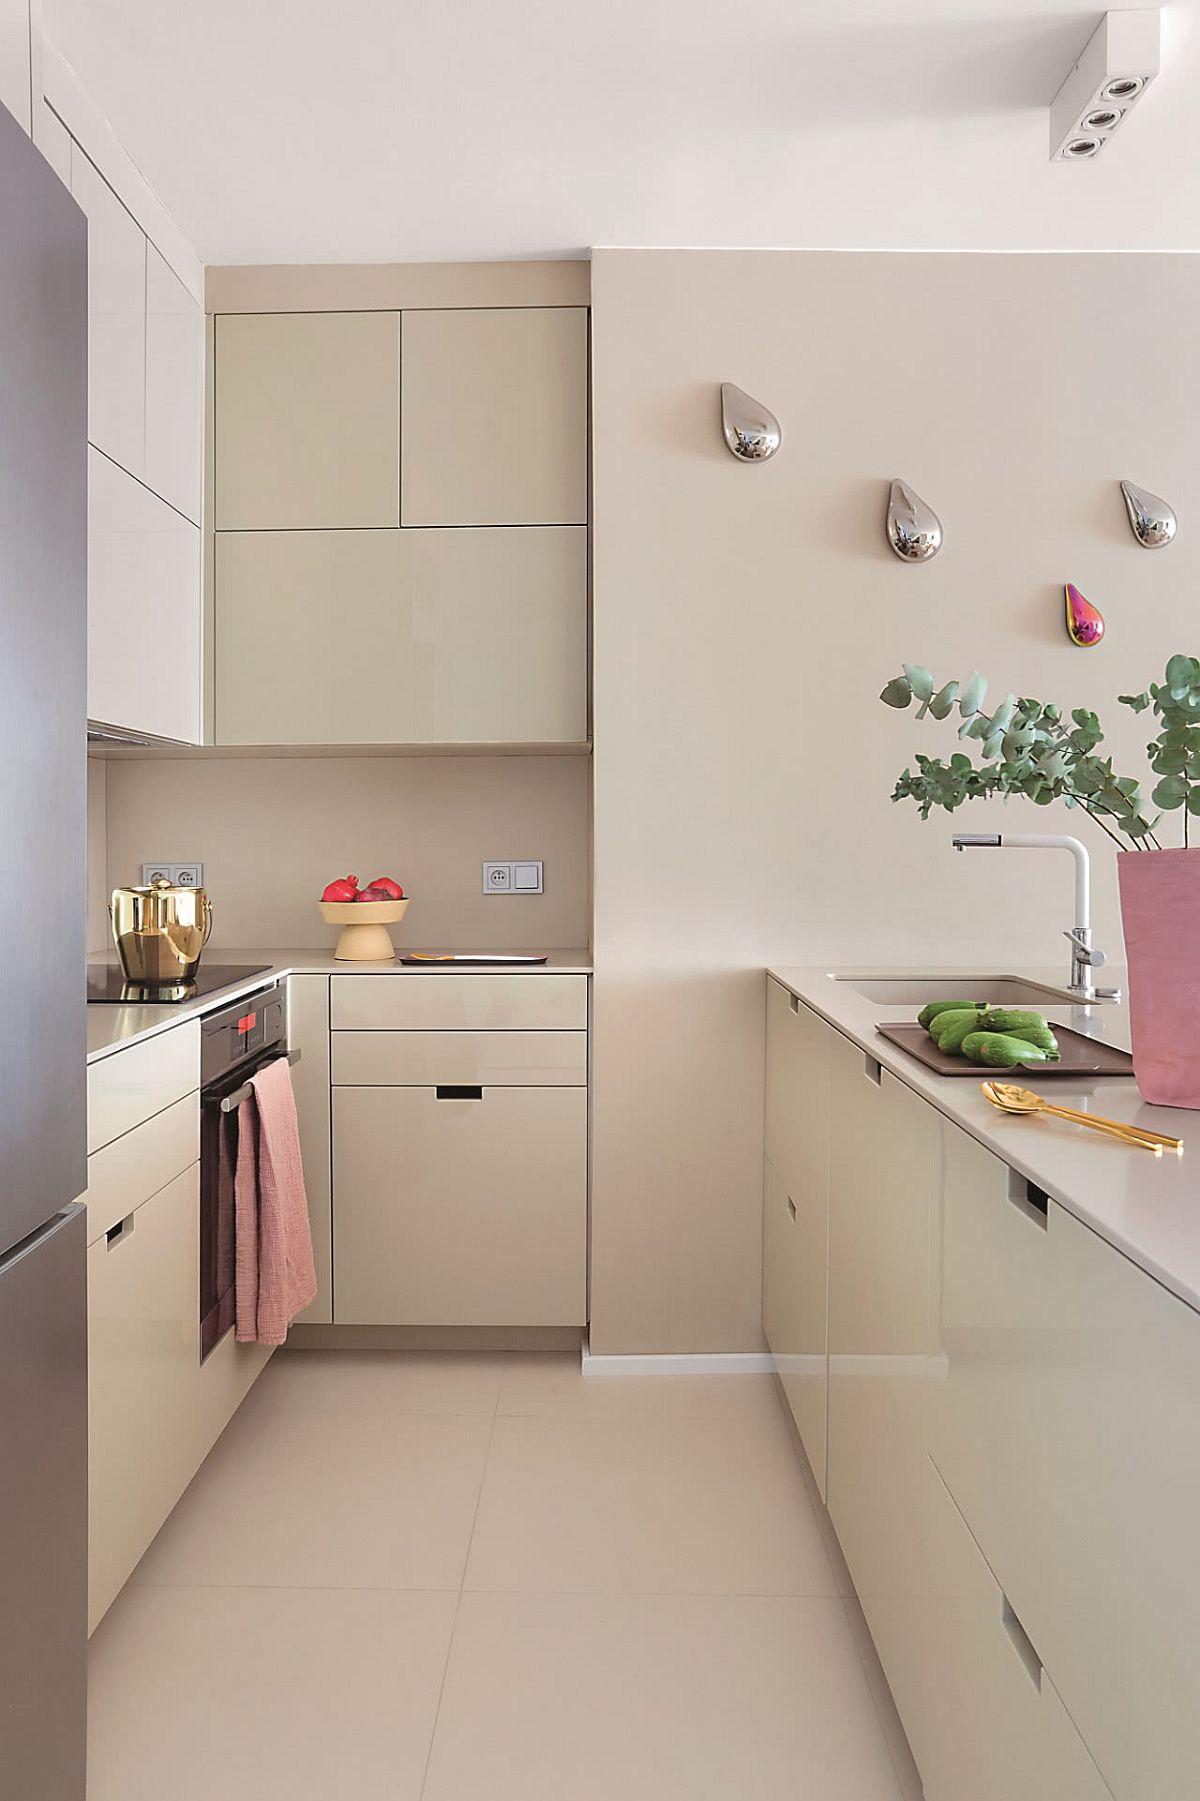 adelaparvu.vom despre amenajare mansarda in nuante pastelate, design Maria Rosaria Bocciuni, Foto Aneta Tryczynska (9)